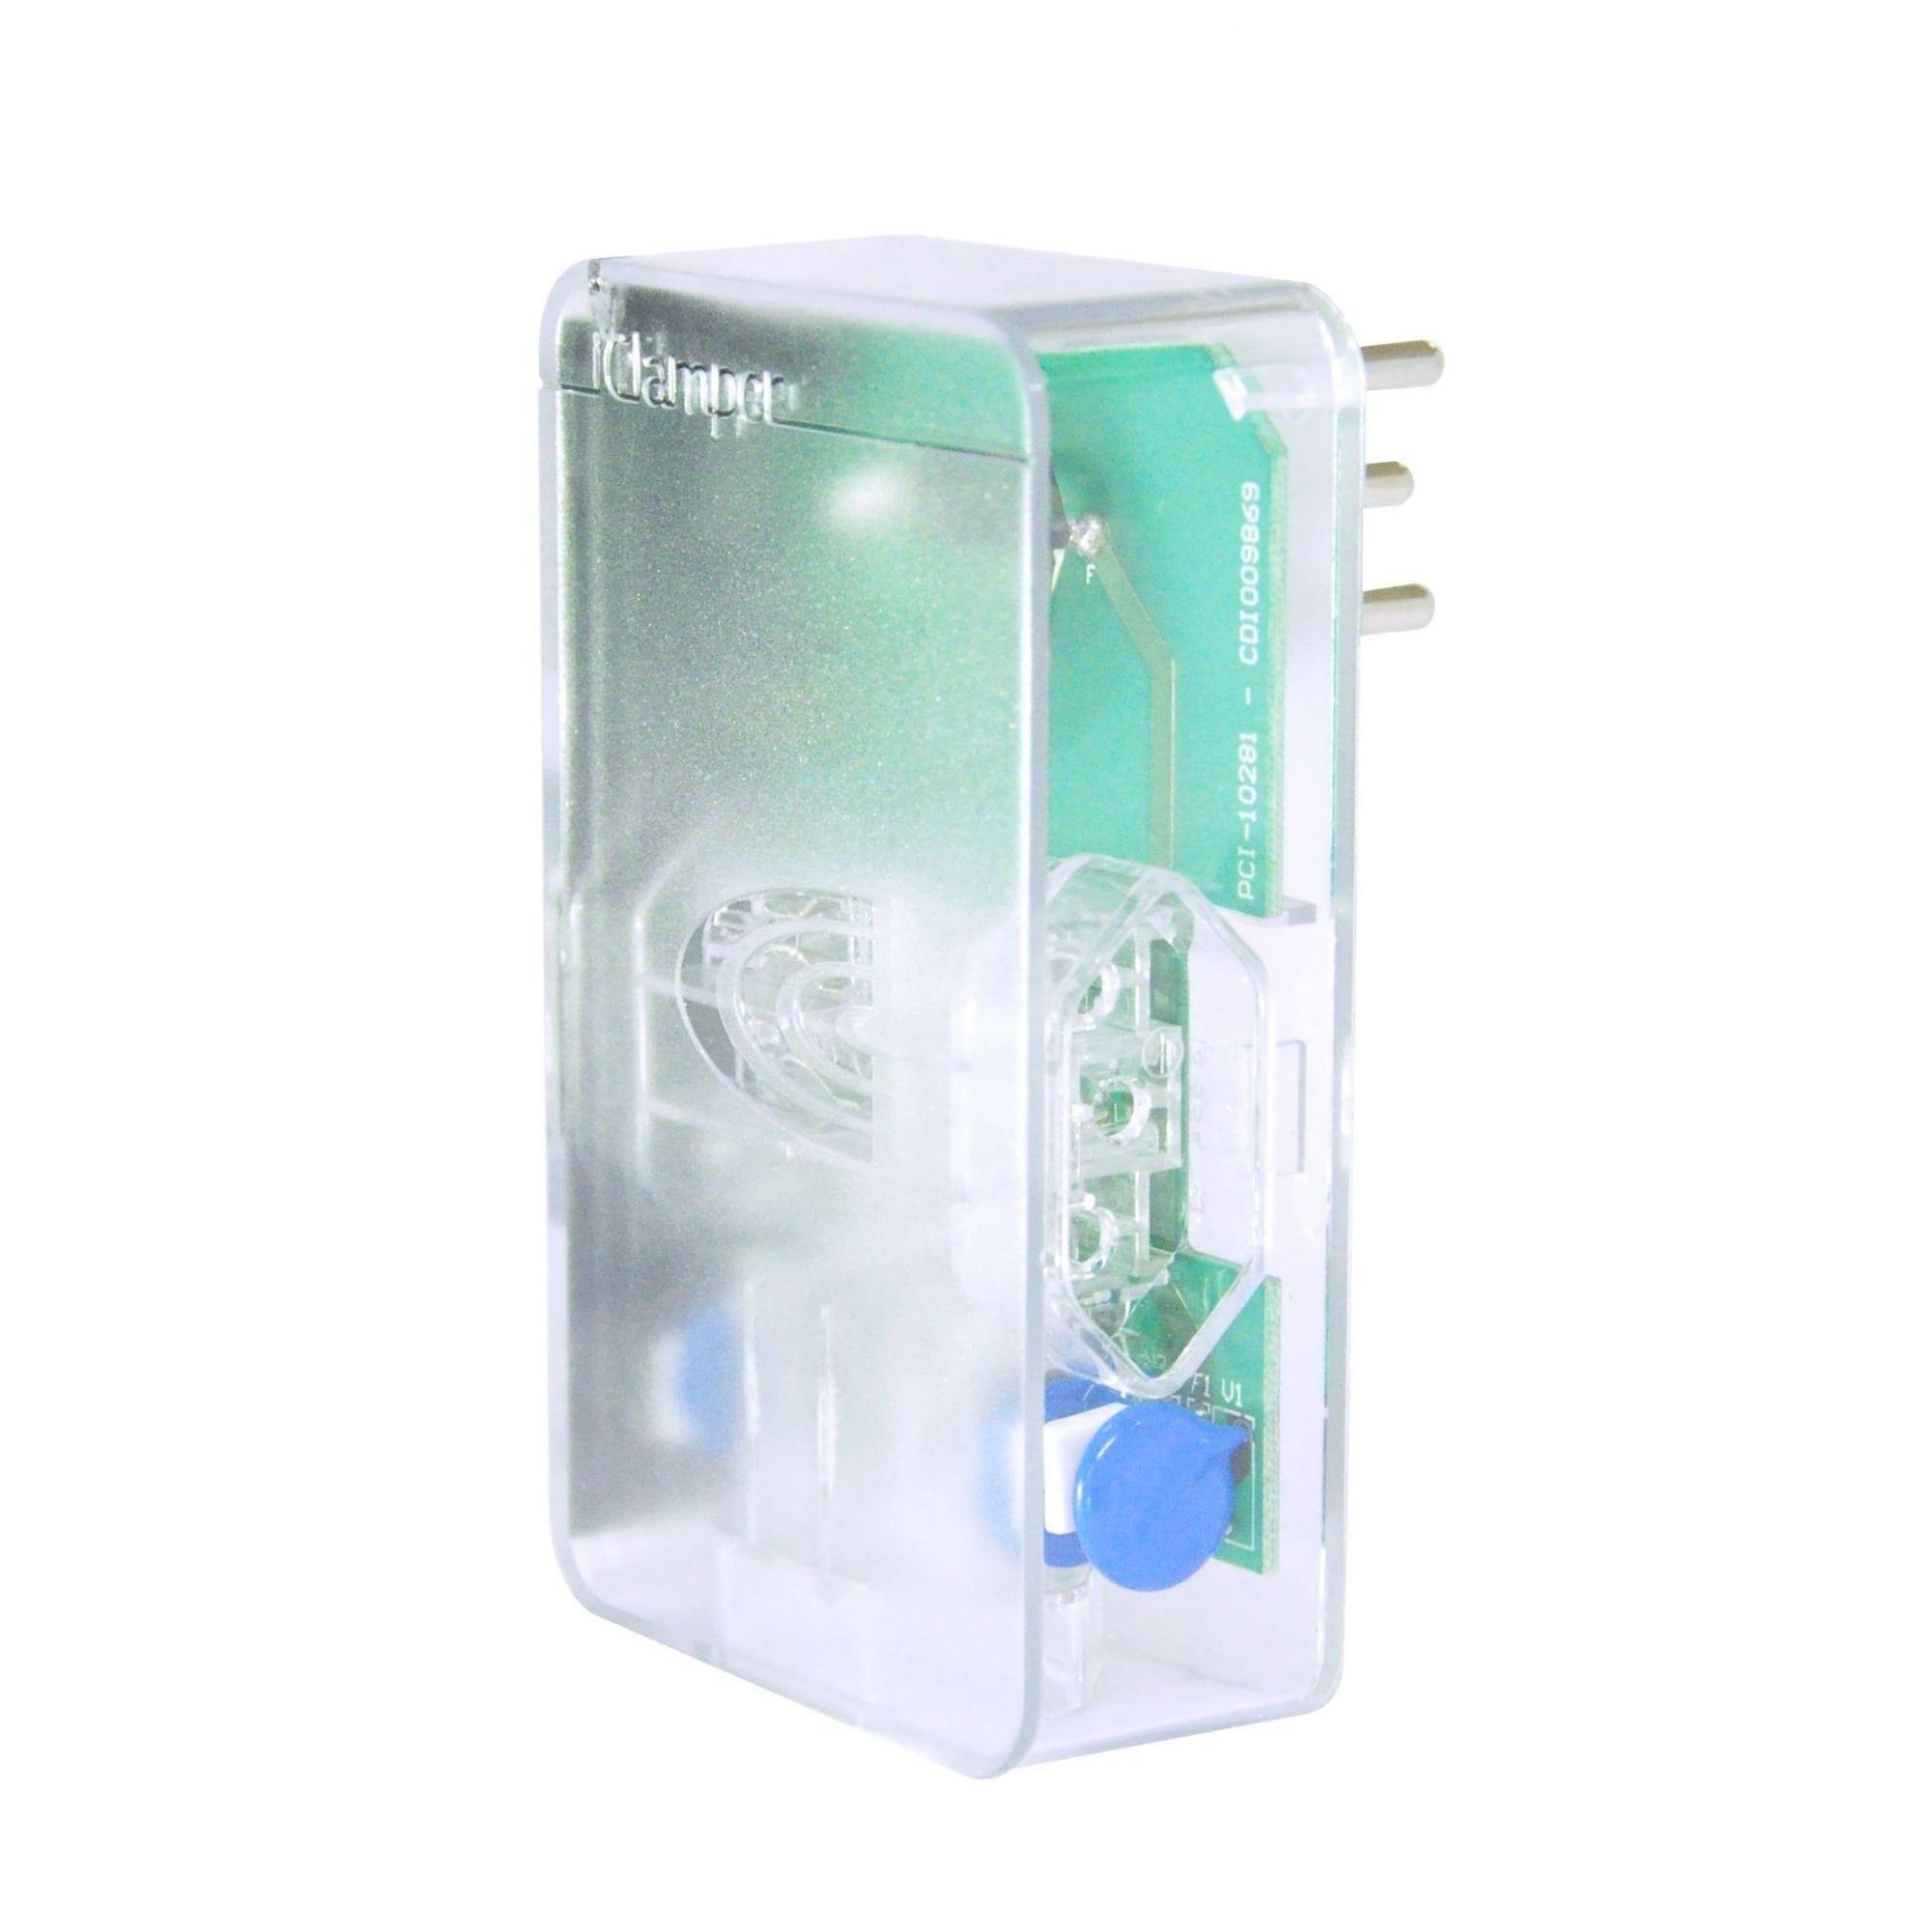 Protetor Surtos Raios Dps Energia 3 Tomadas 10647 Clamper